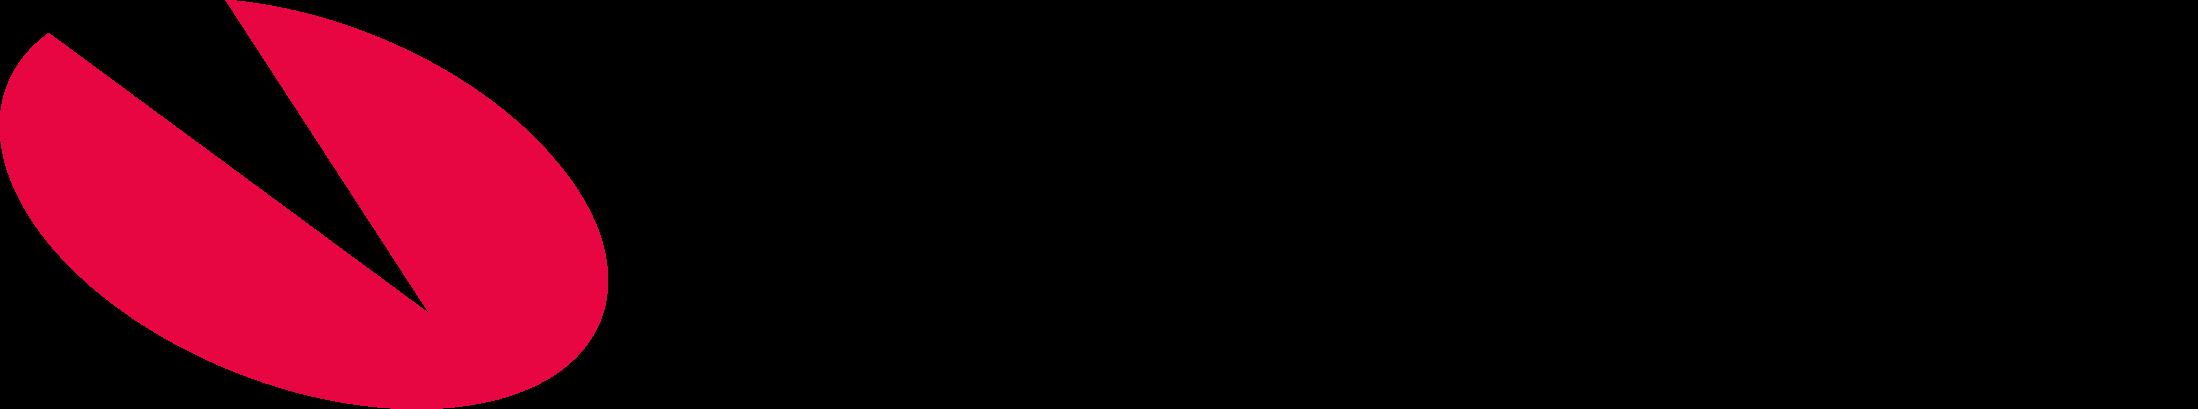 visma logo - pre-built integration API on platform